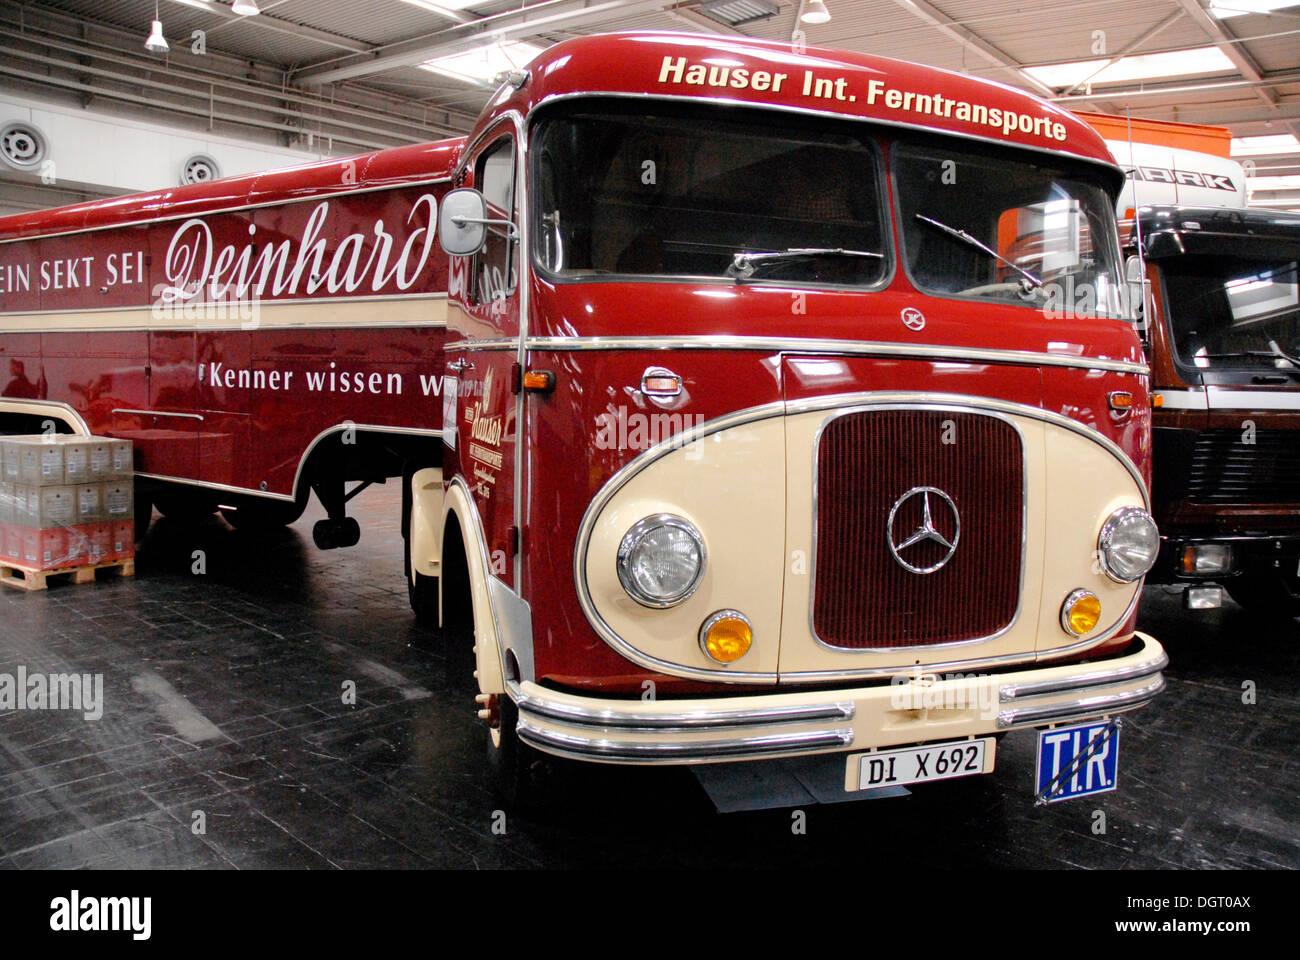 mercedes benz oldtimer truck with deinhard trailer nutzfahrzeug iaa stock photo royalty free. Black Bedroom Furniture Sets. Home Design Ideas